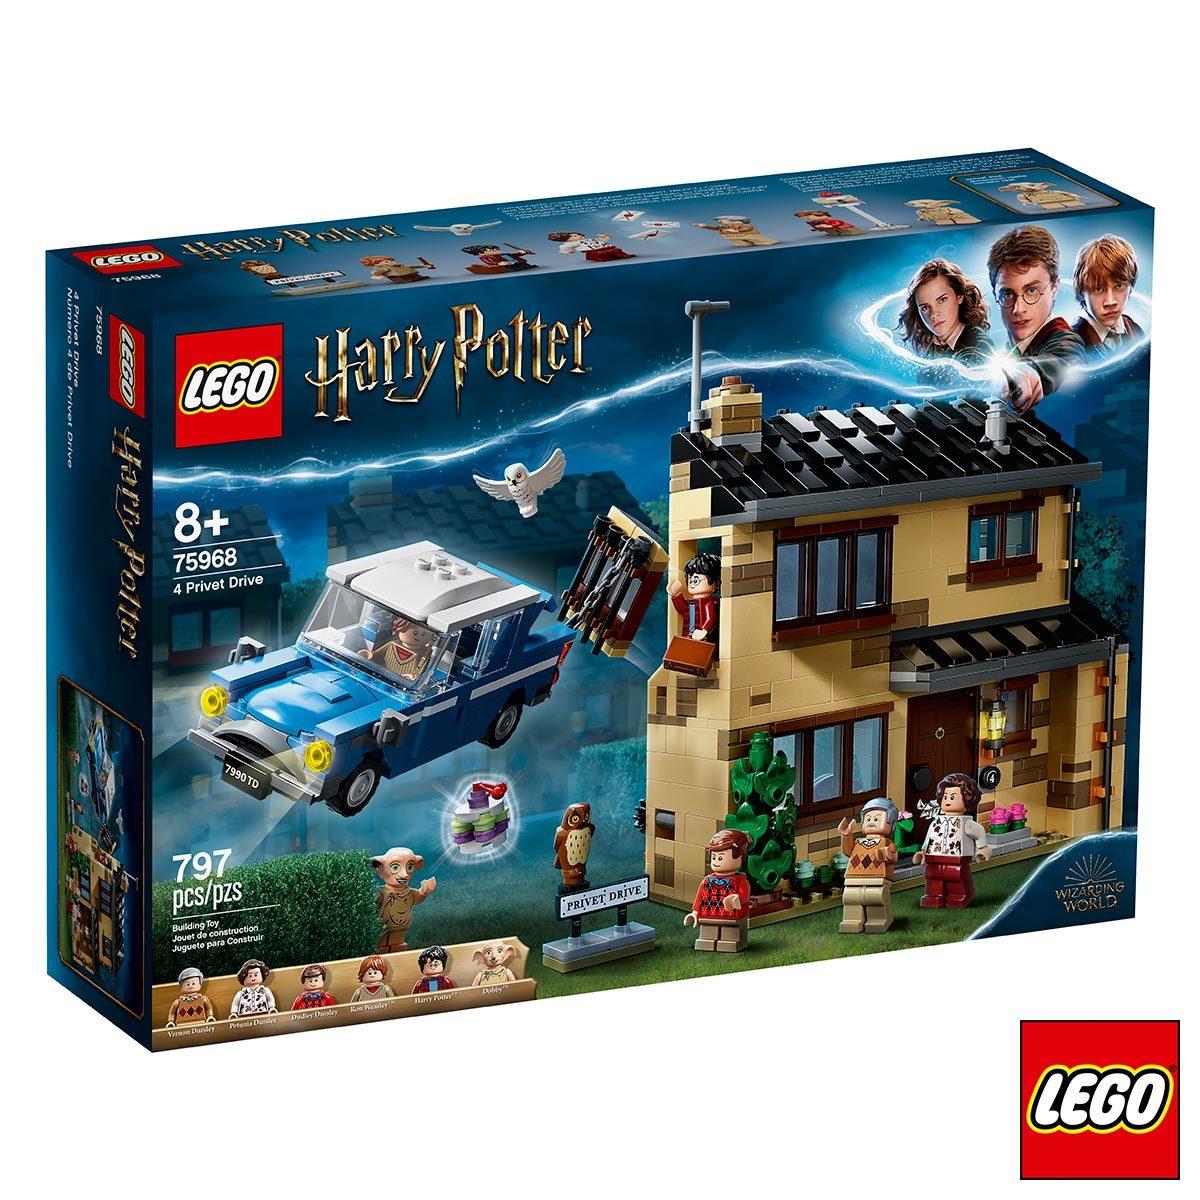 Harry Potter 4 Pack House Hand Cream Set 120g